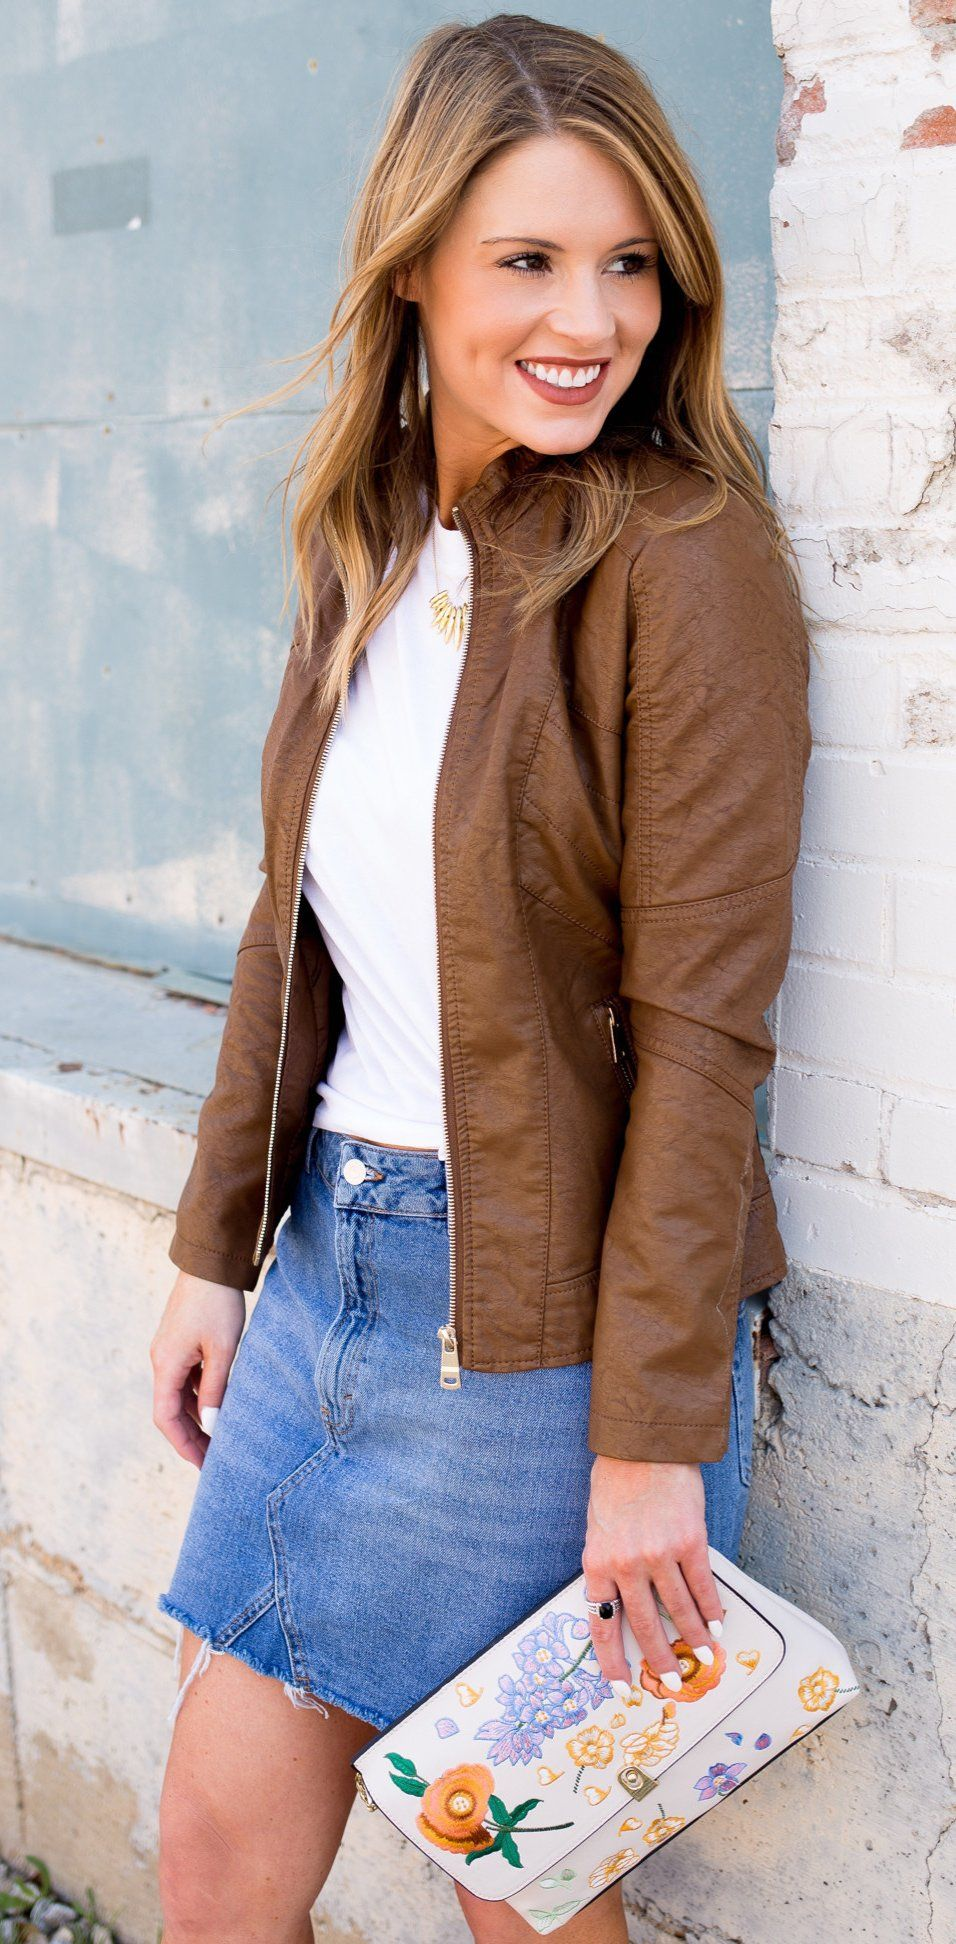 Leather jacket yahoo answers -  Spring Fashion Brown Leather Jacket Denim Skirt